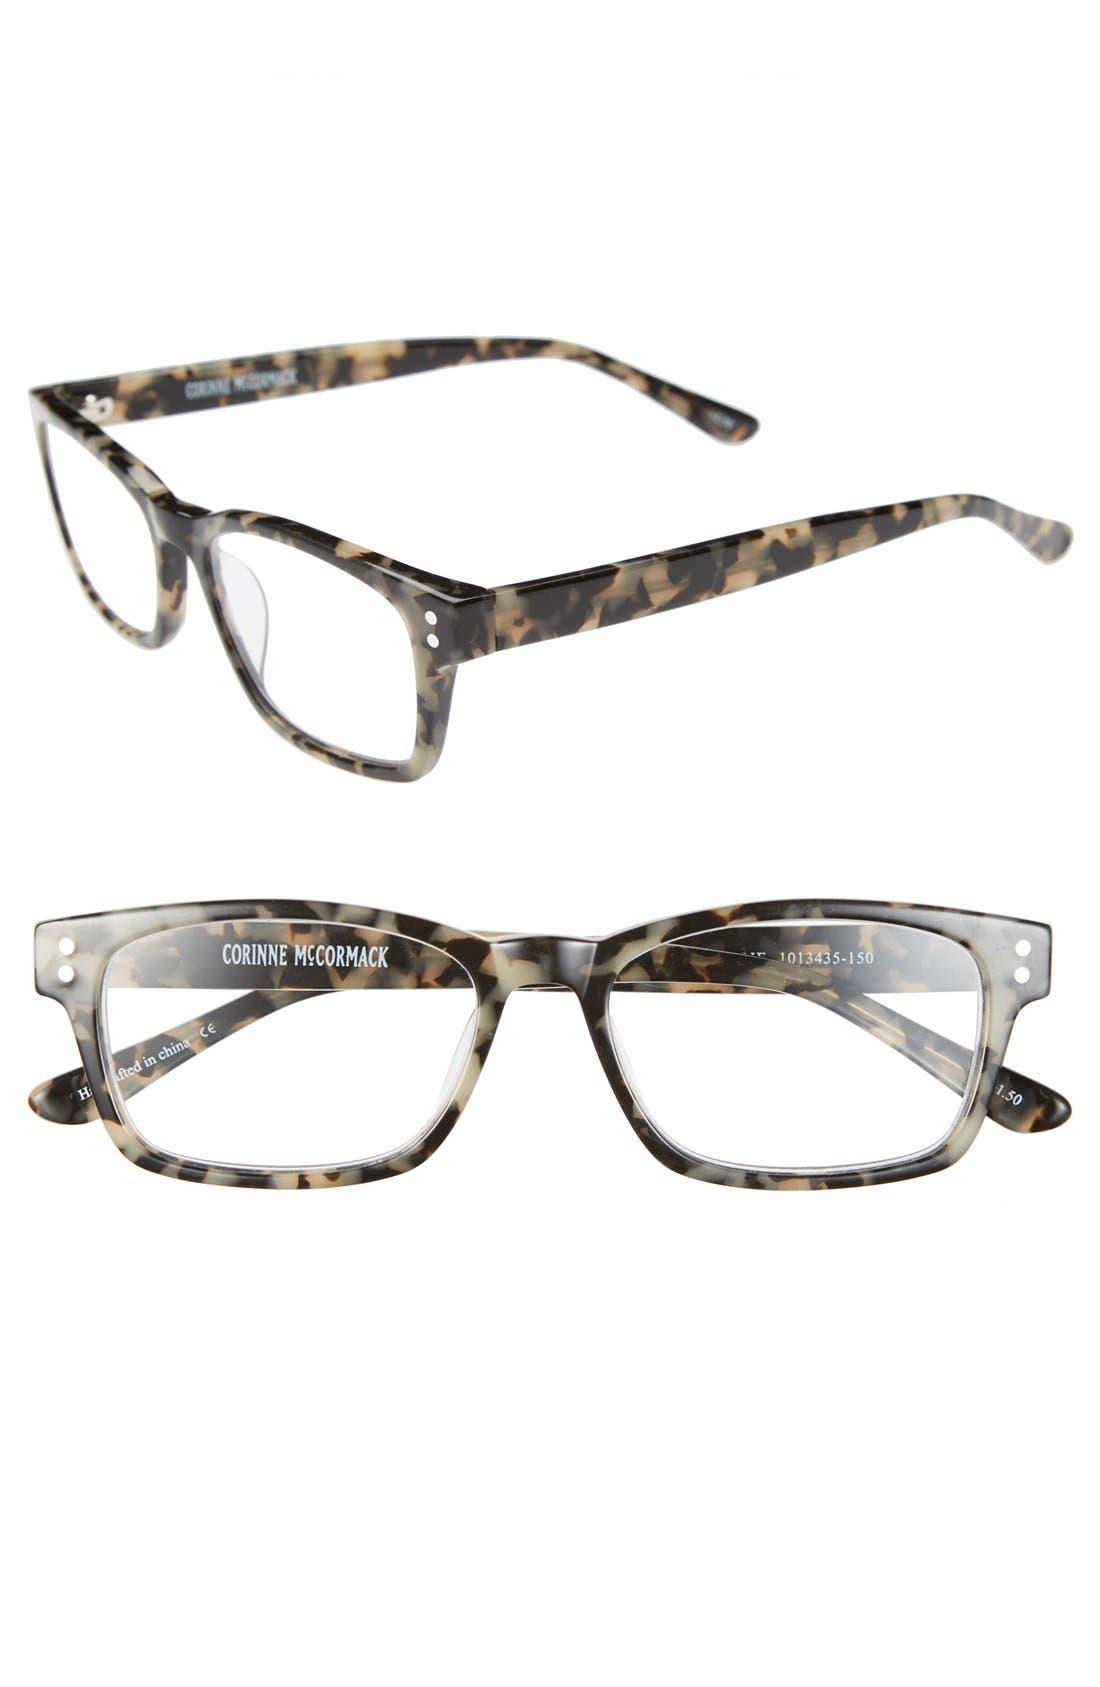 Alternate Image 1 Selected - Corinne McCormack 'Edie' 51mm Reading Glasses